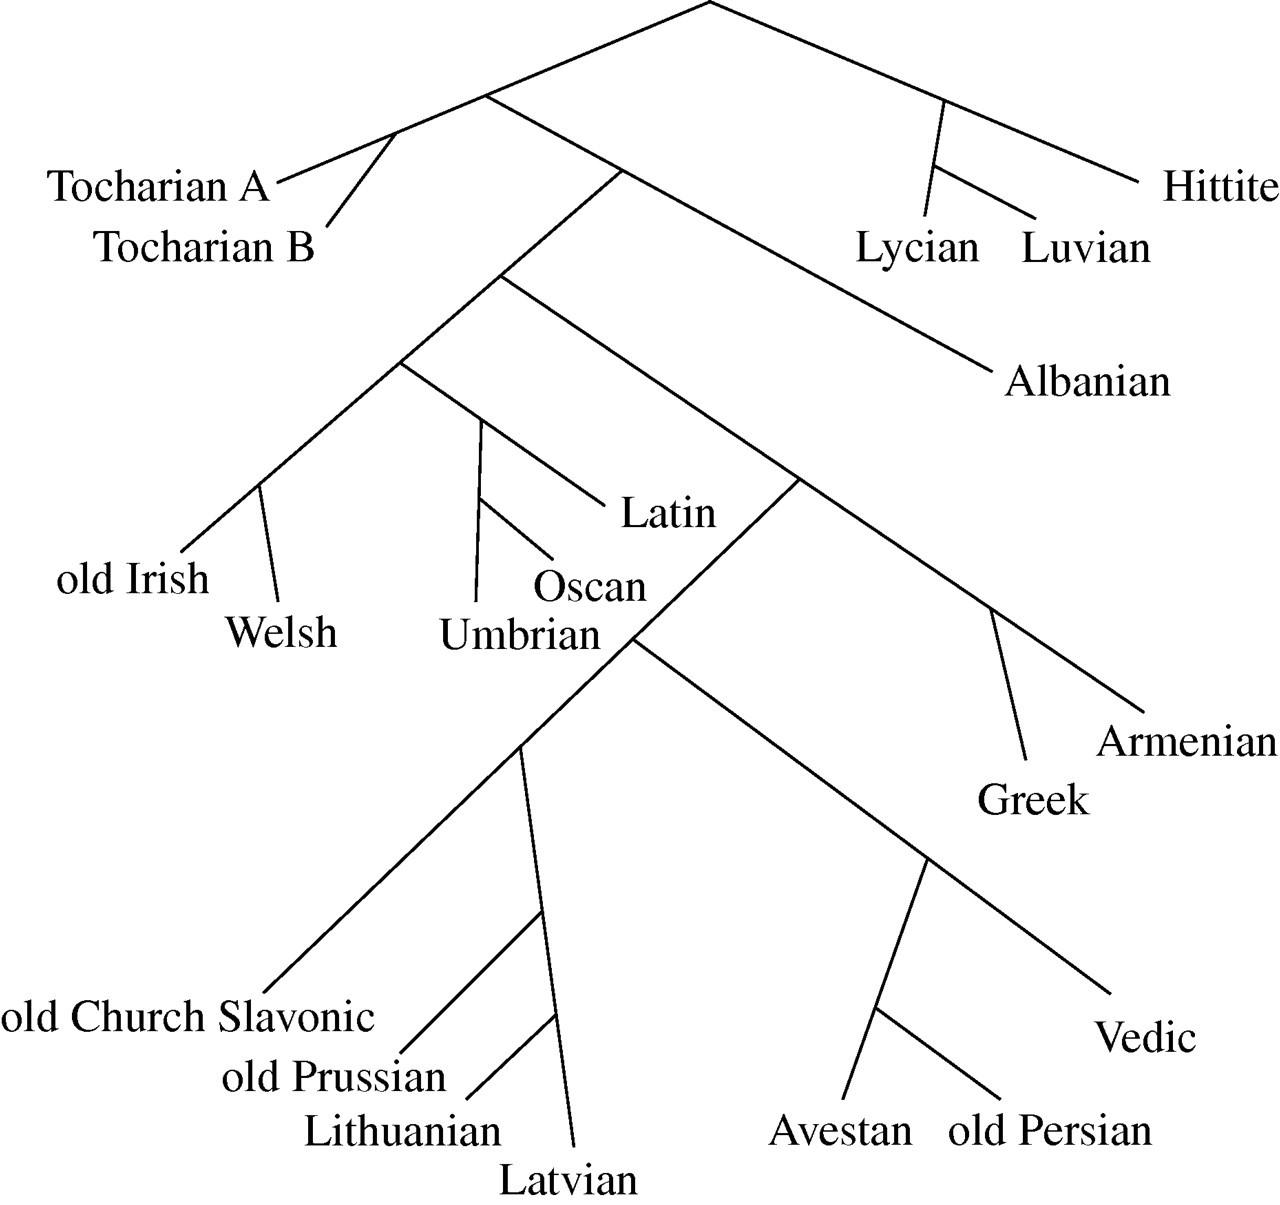 Splits or waves? Trees or webs? How divergence measures